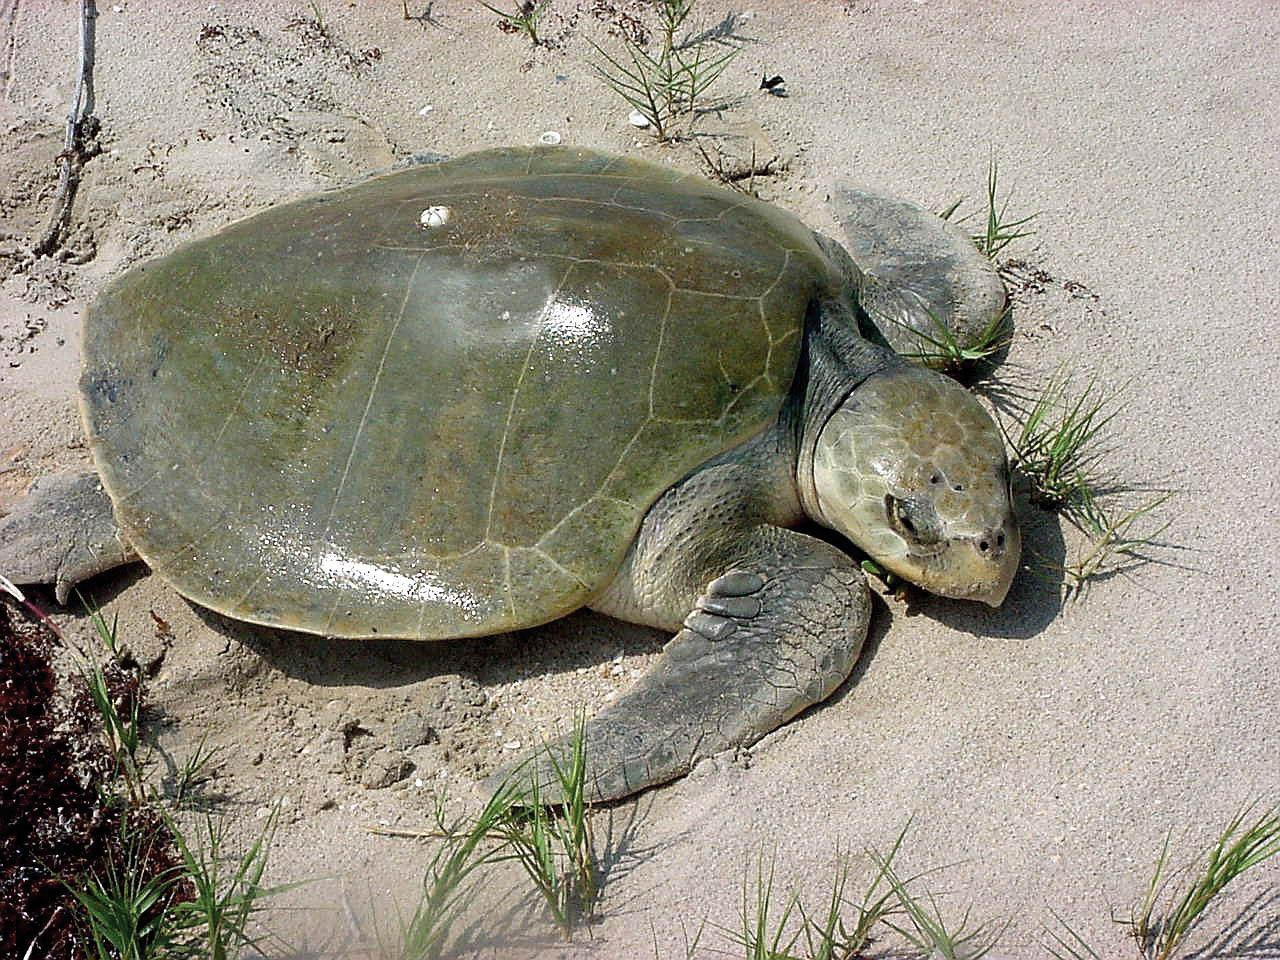 A Kemp's Ridley sea turtle on a nesting beach. © THANE WIBBELS